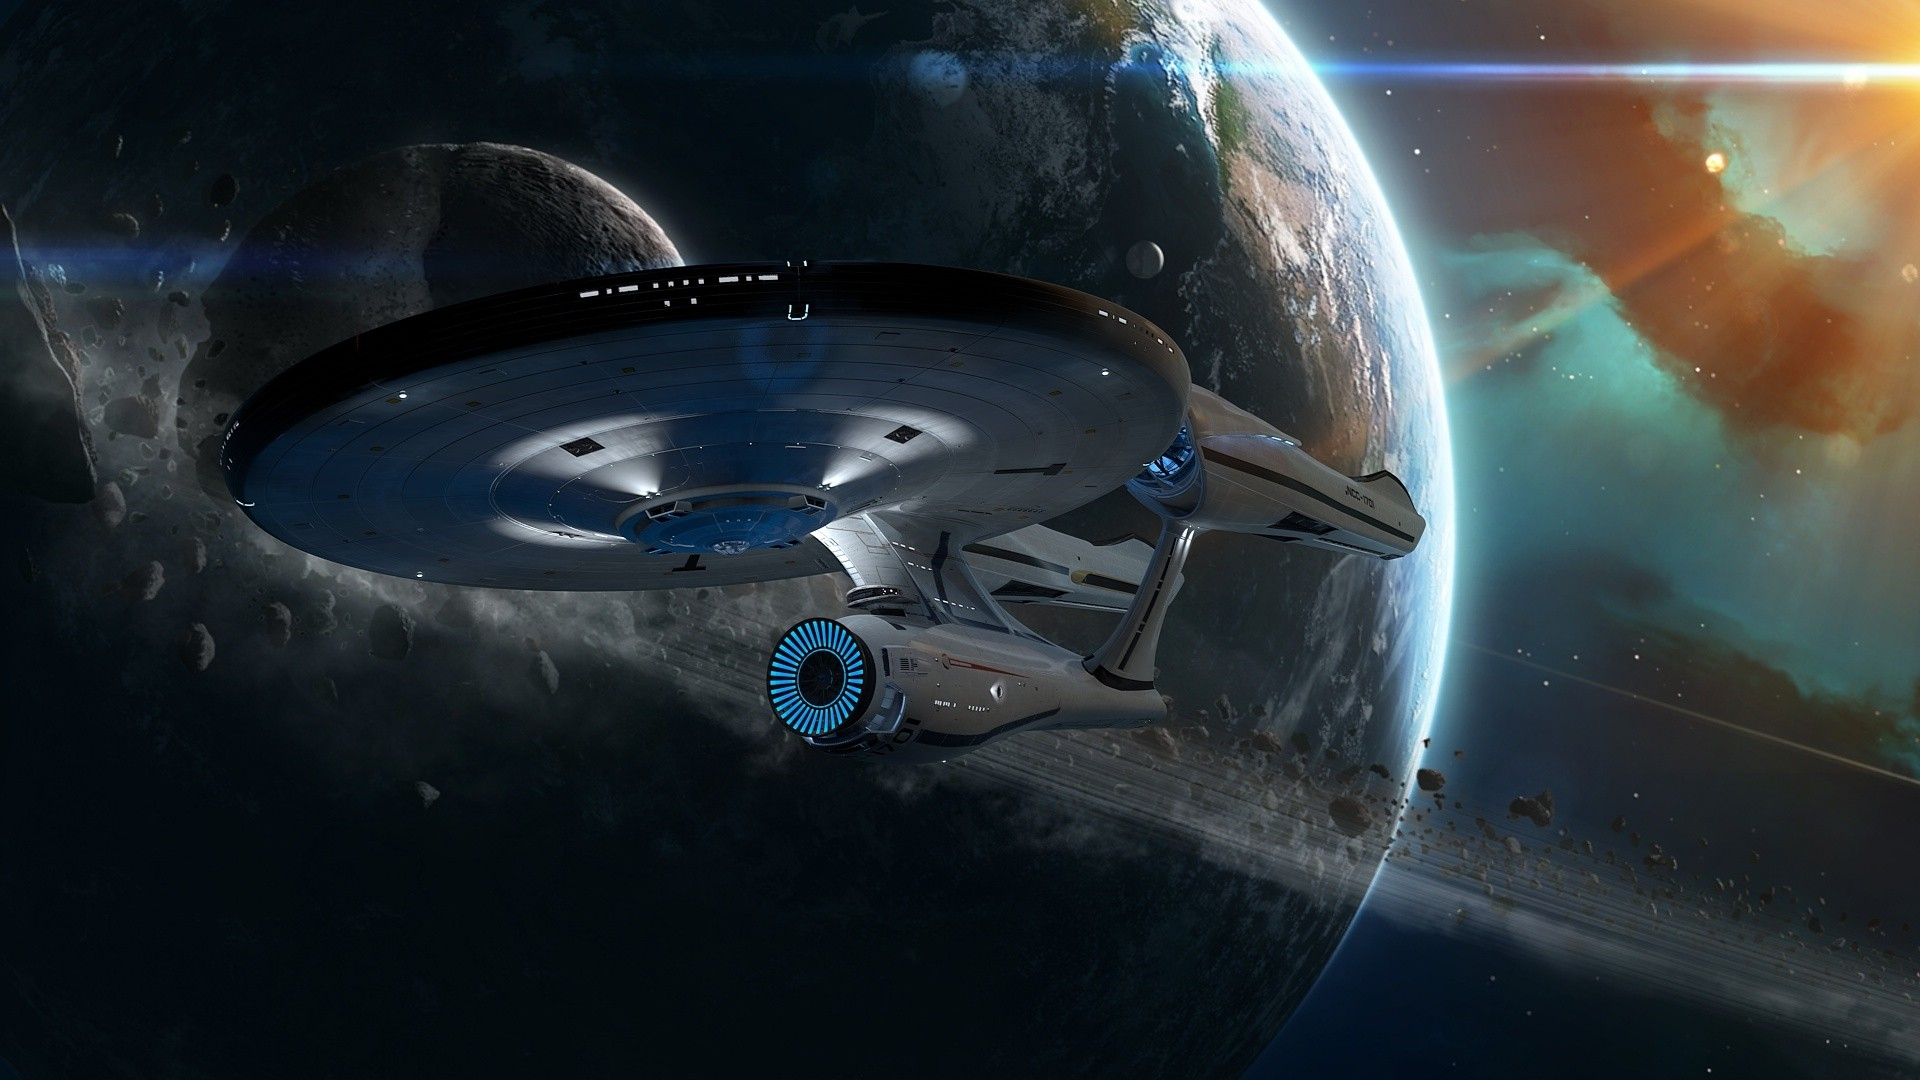 Star Trek Wallpaper Picture hd